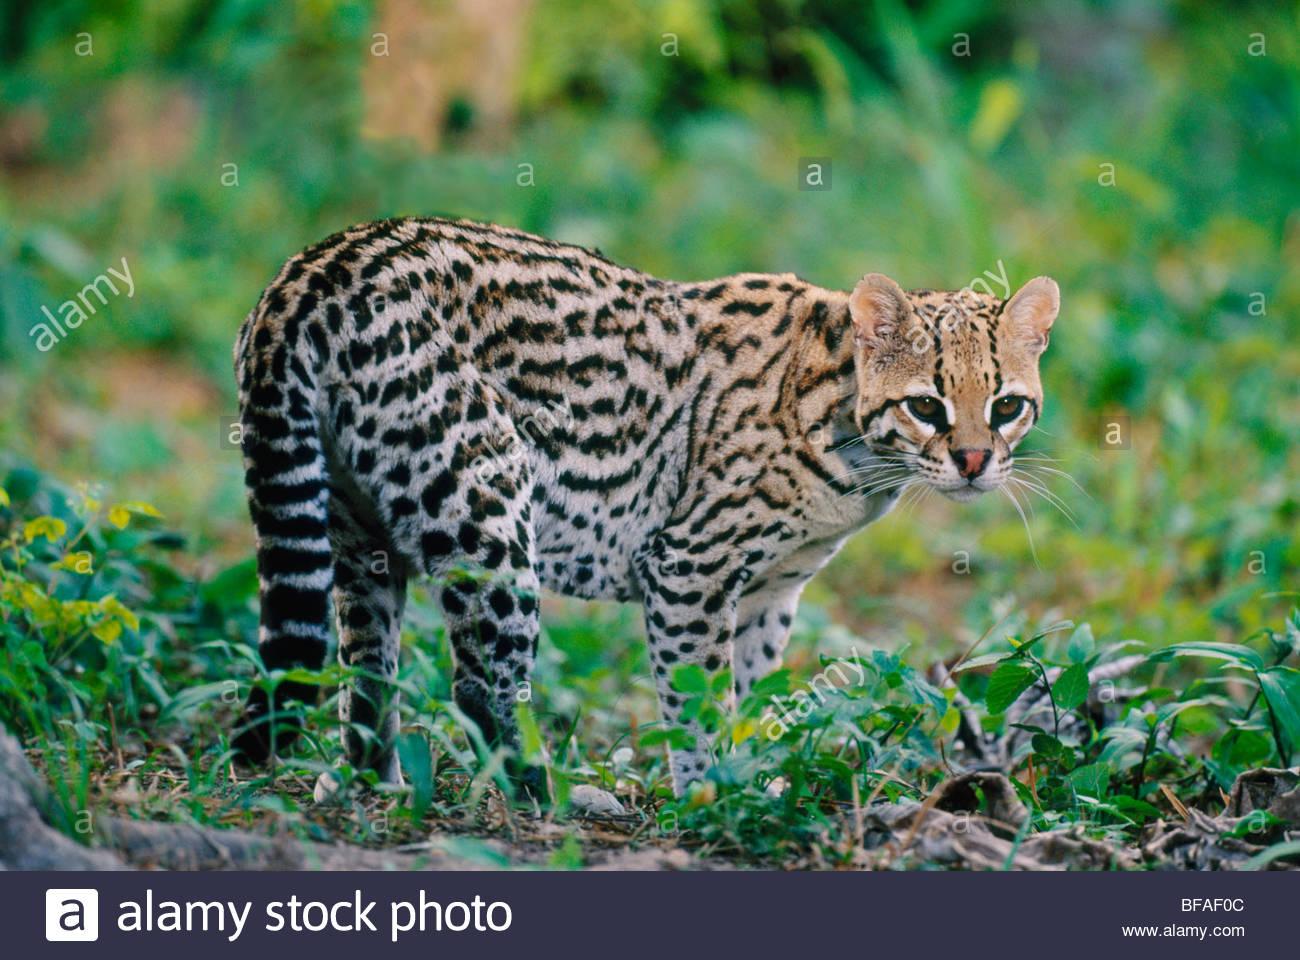 Ocelot, Leopardus pardalis, Pantanal, Brazil - Stock Image